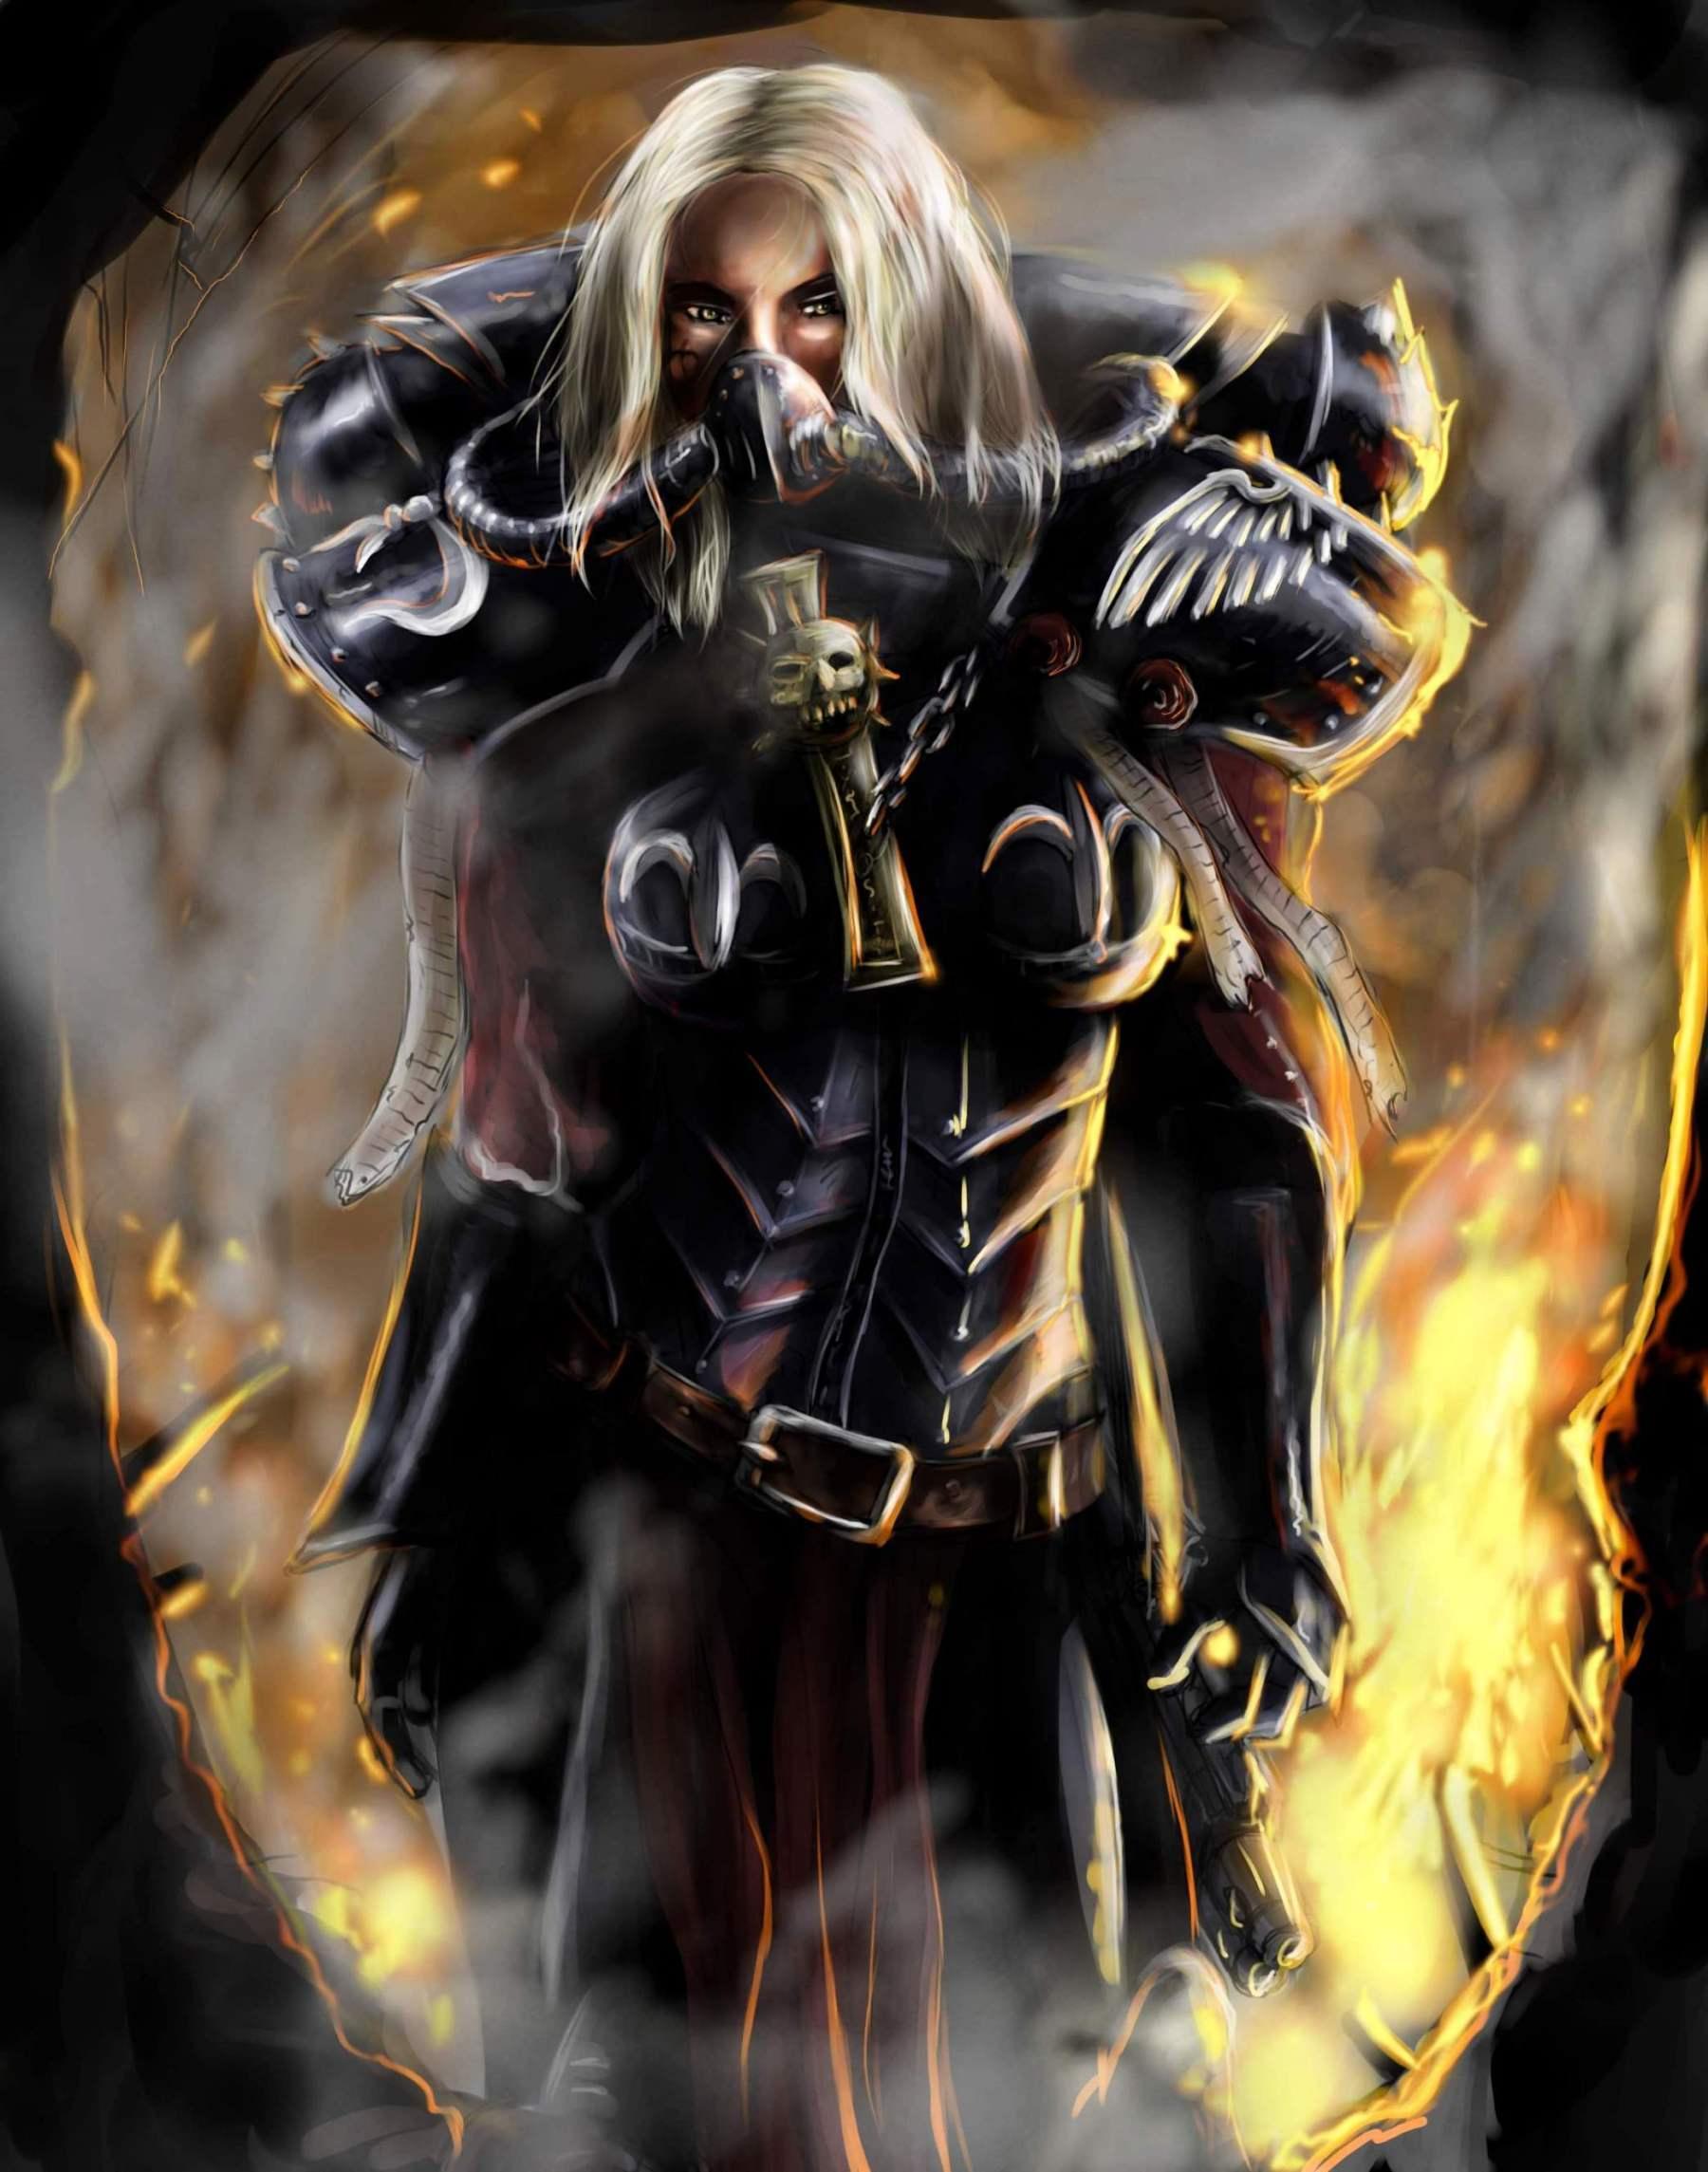 Artwork, Badass, Sisters Of Battle, Warhammer 40,000